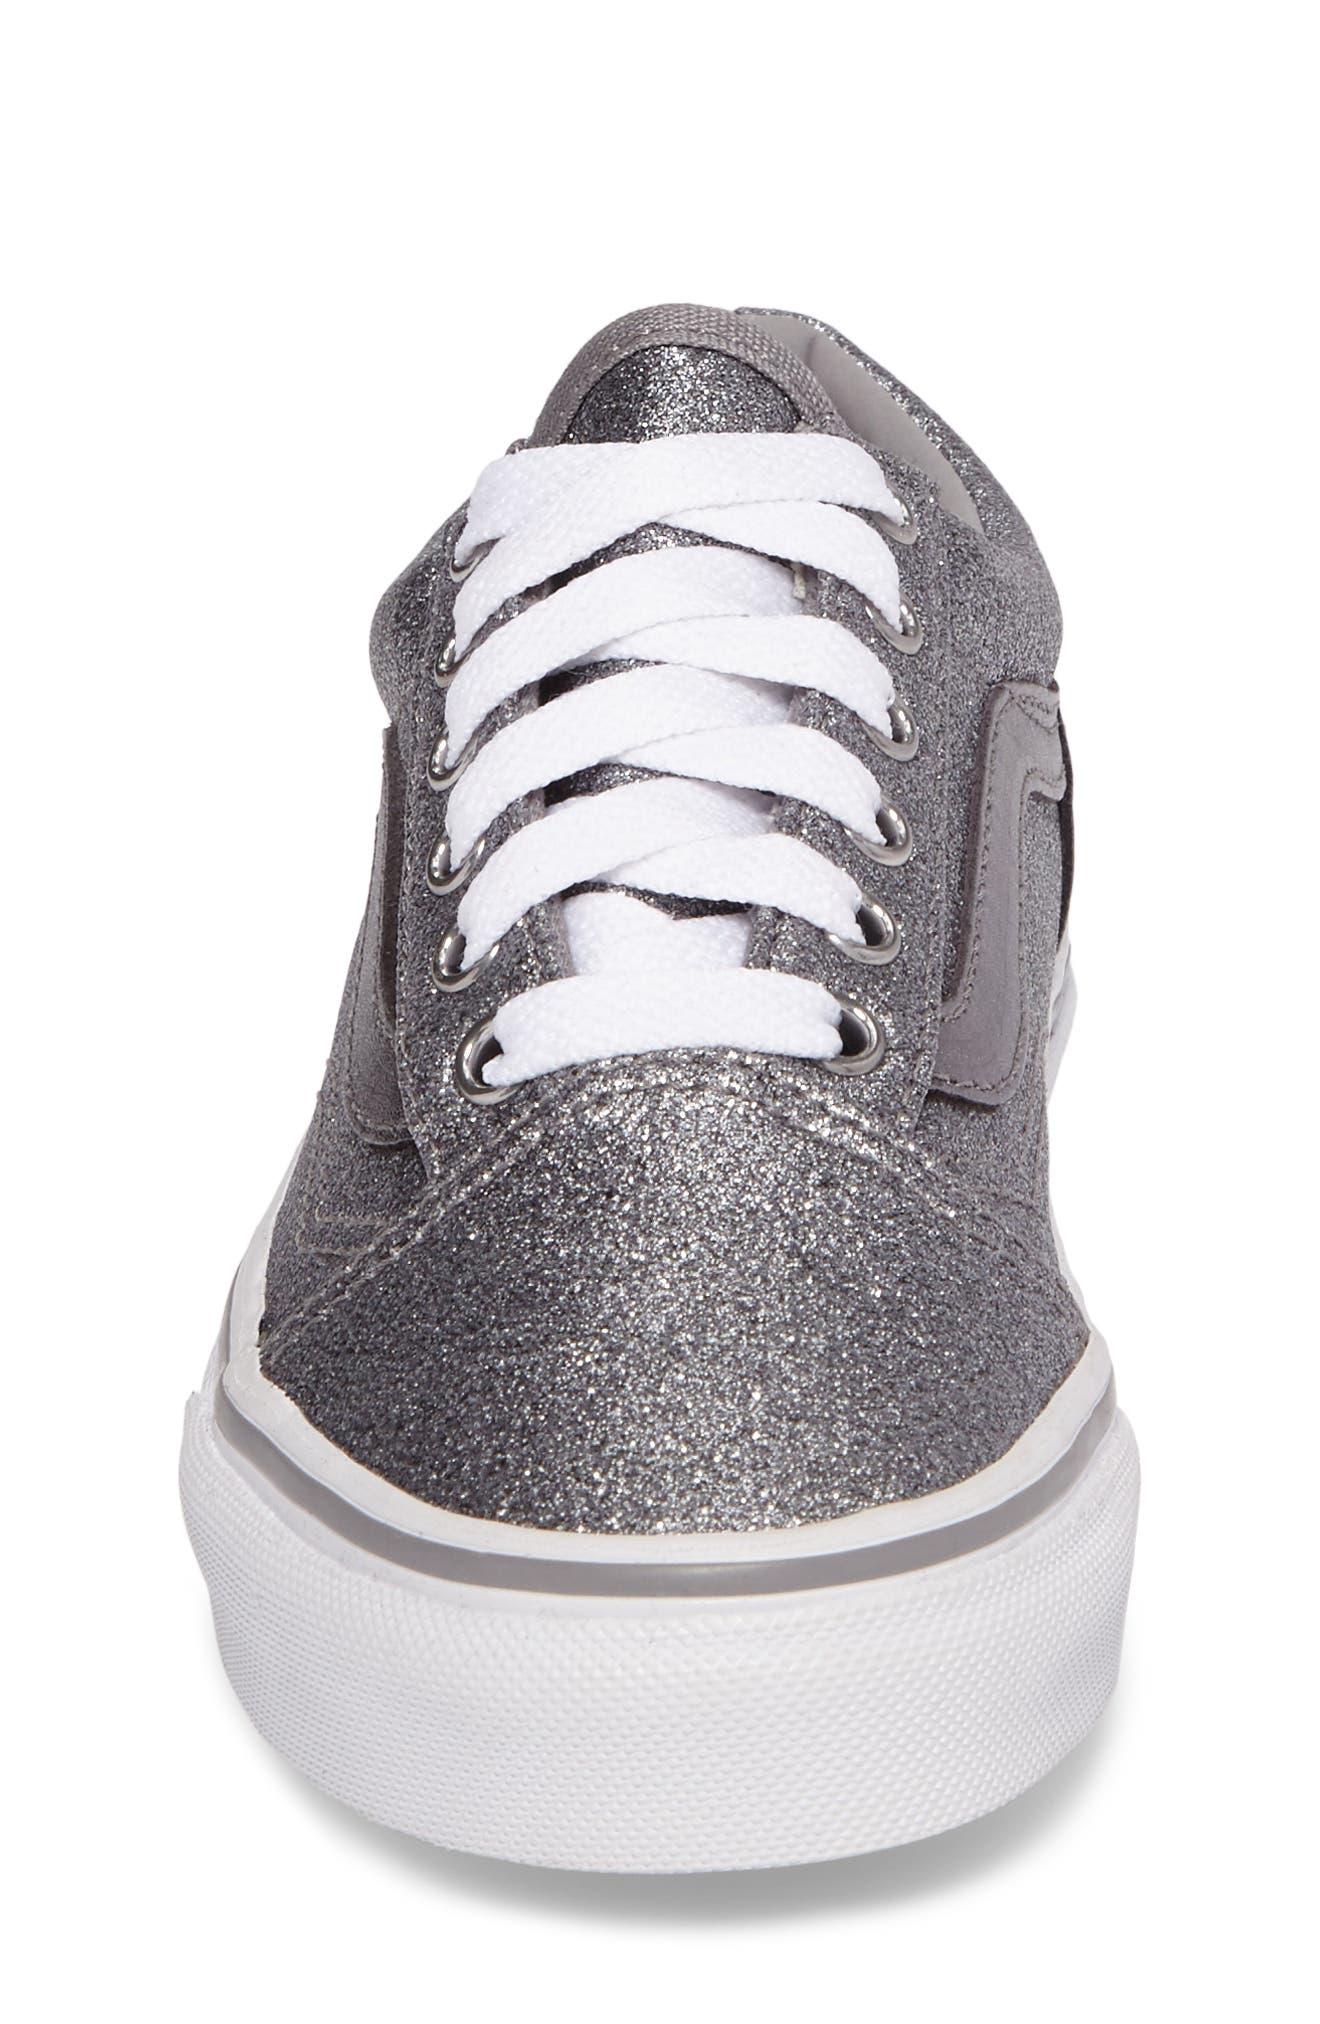 Alternate Image 4  - Vans Old Skool Glitter Sneaker (Toddler, Little Kid & Big Kid)